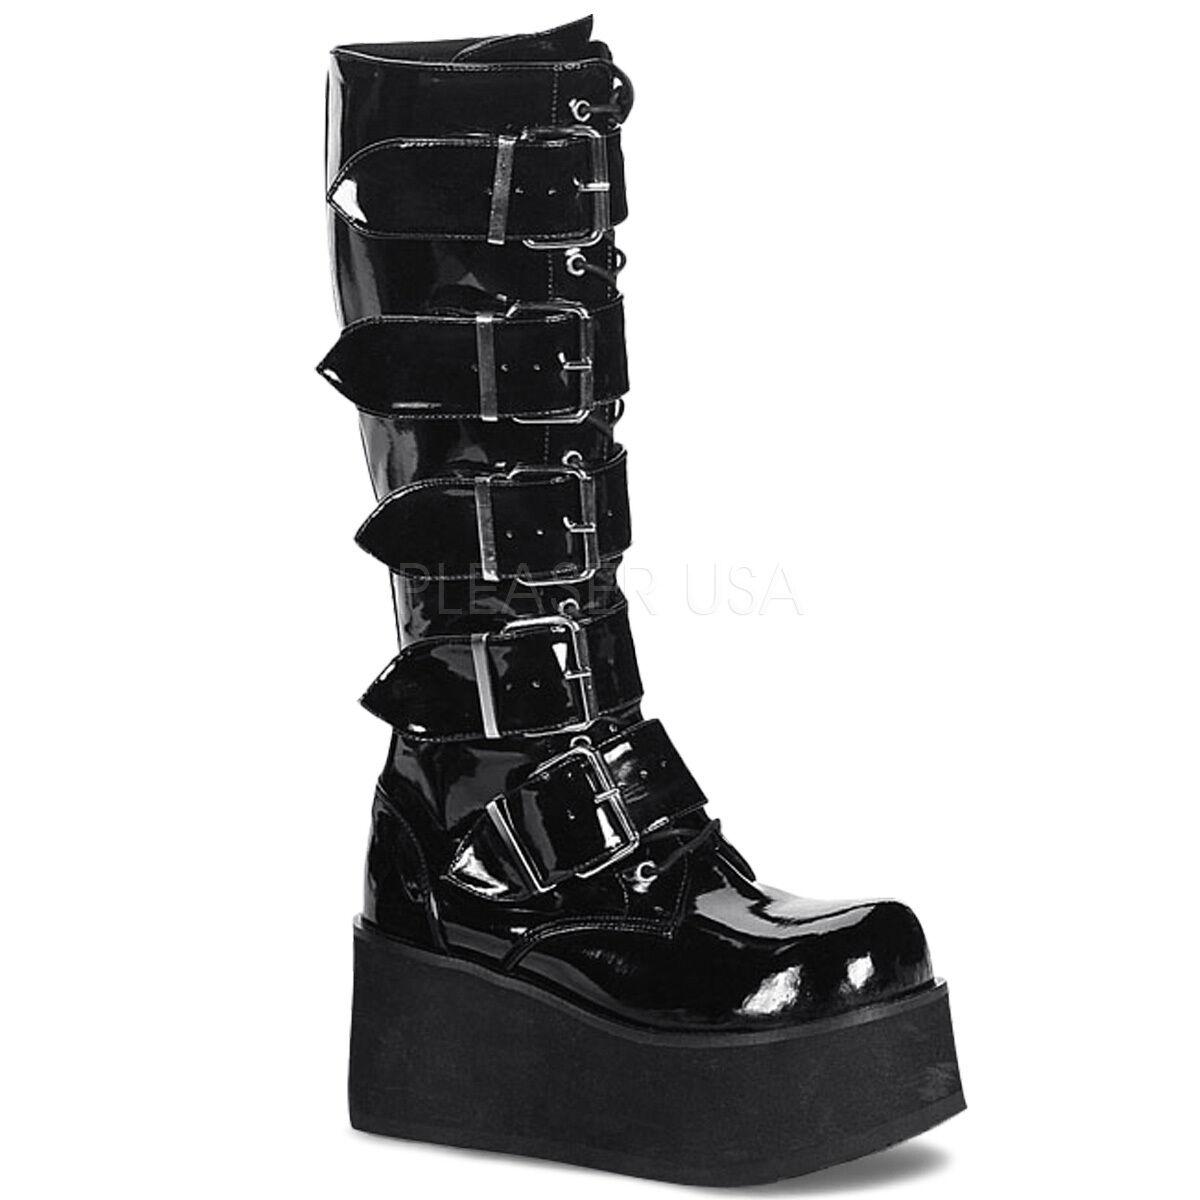 DEMONIA TRA518/B Women's Industrial Goth Punk Platform Buckle Strap Knee Boots